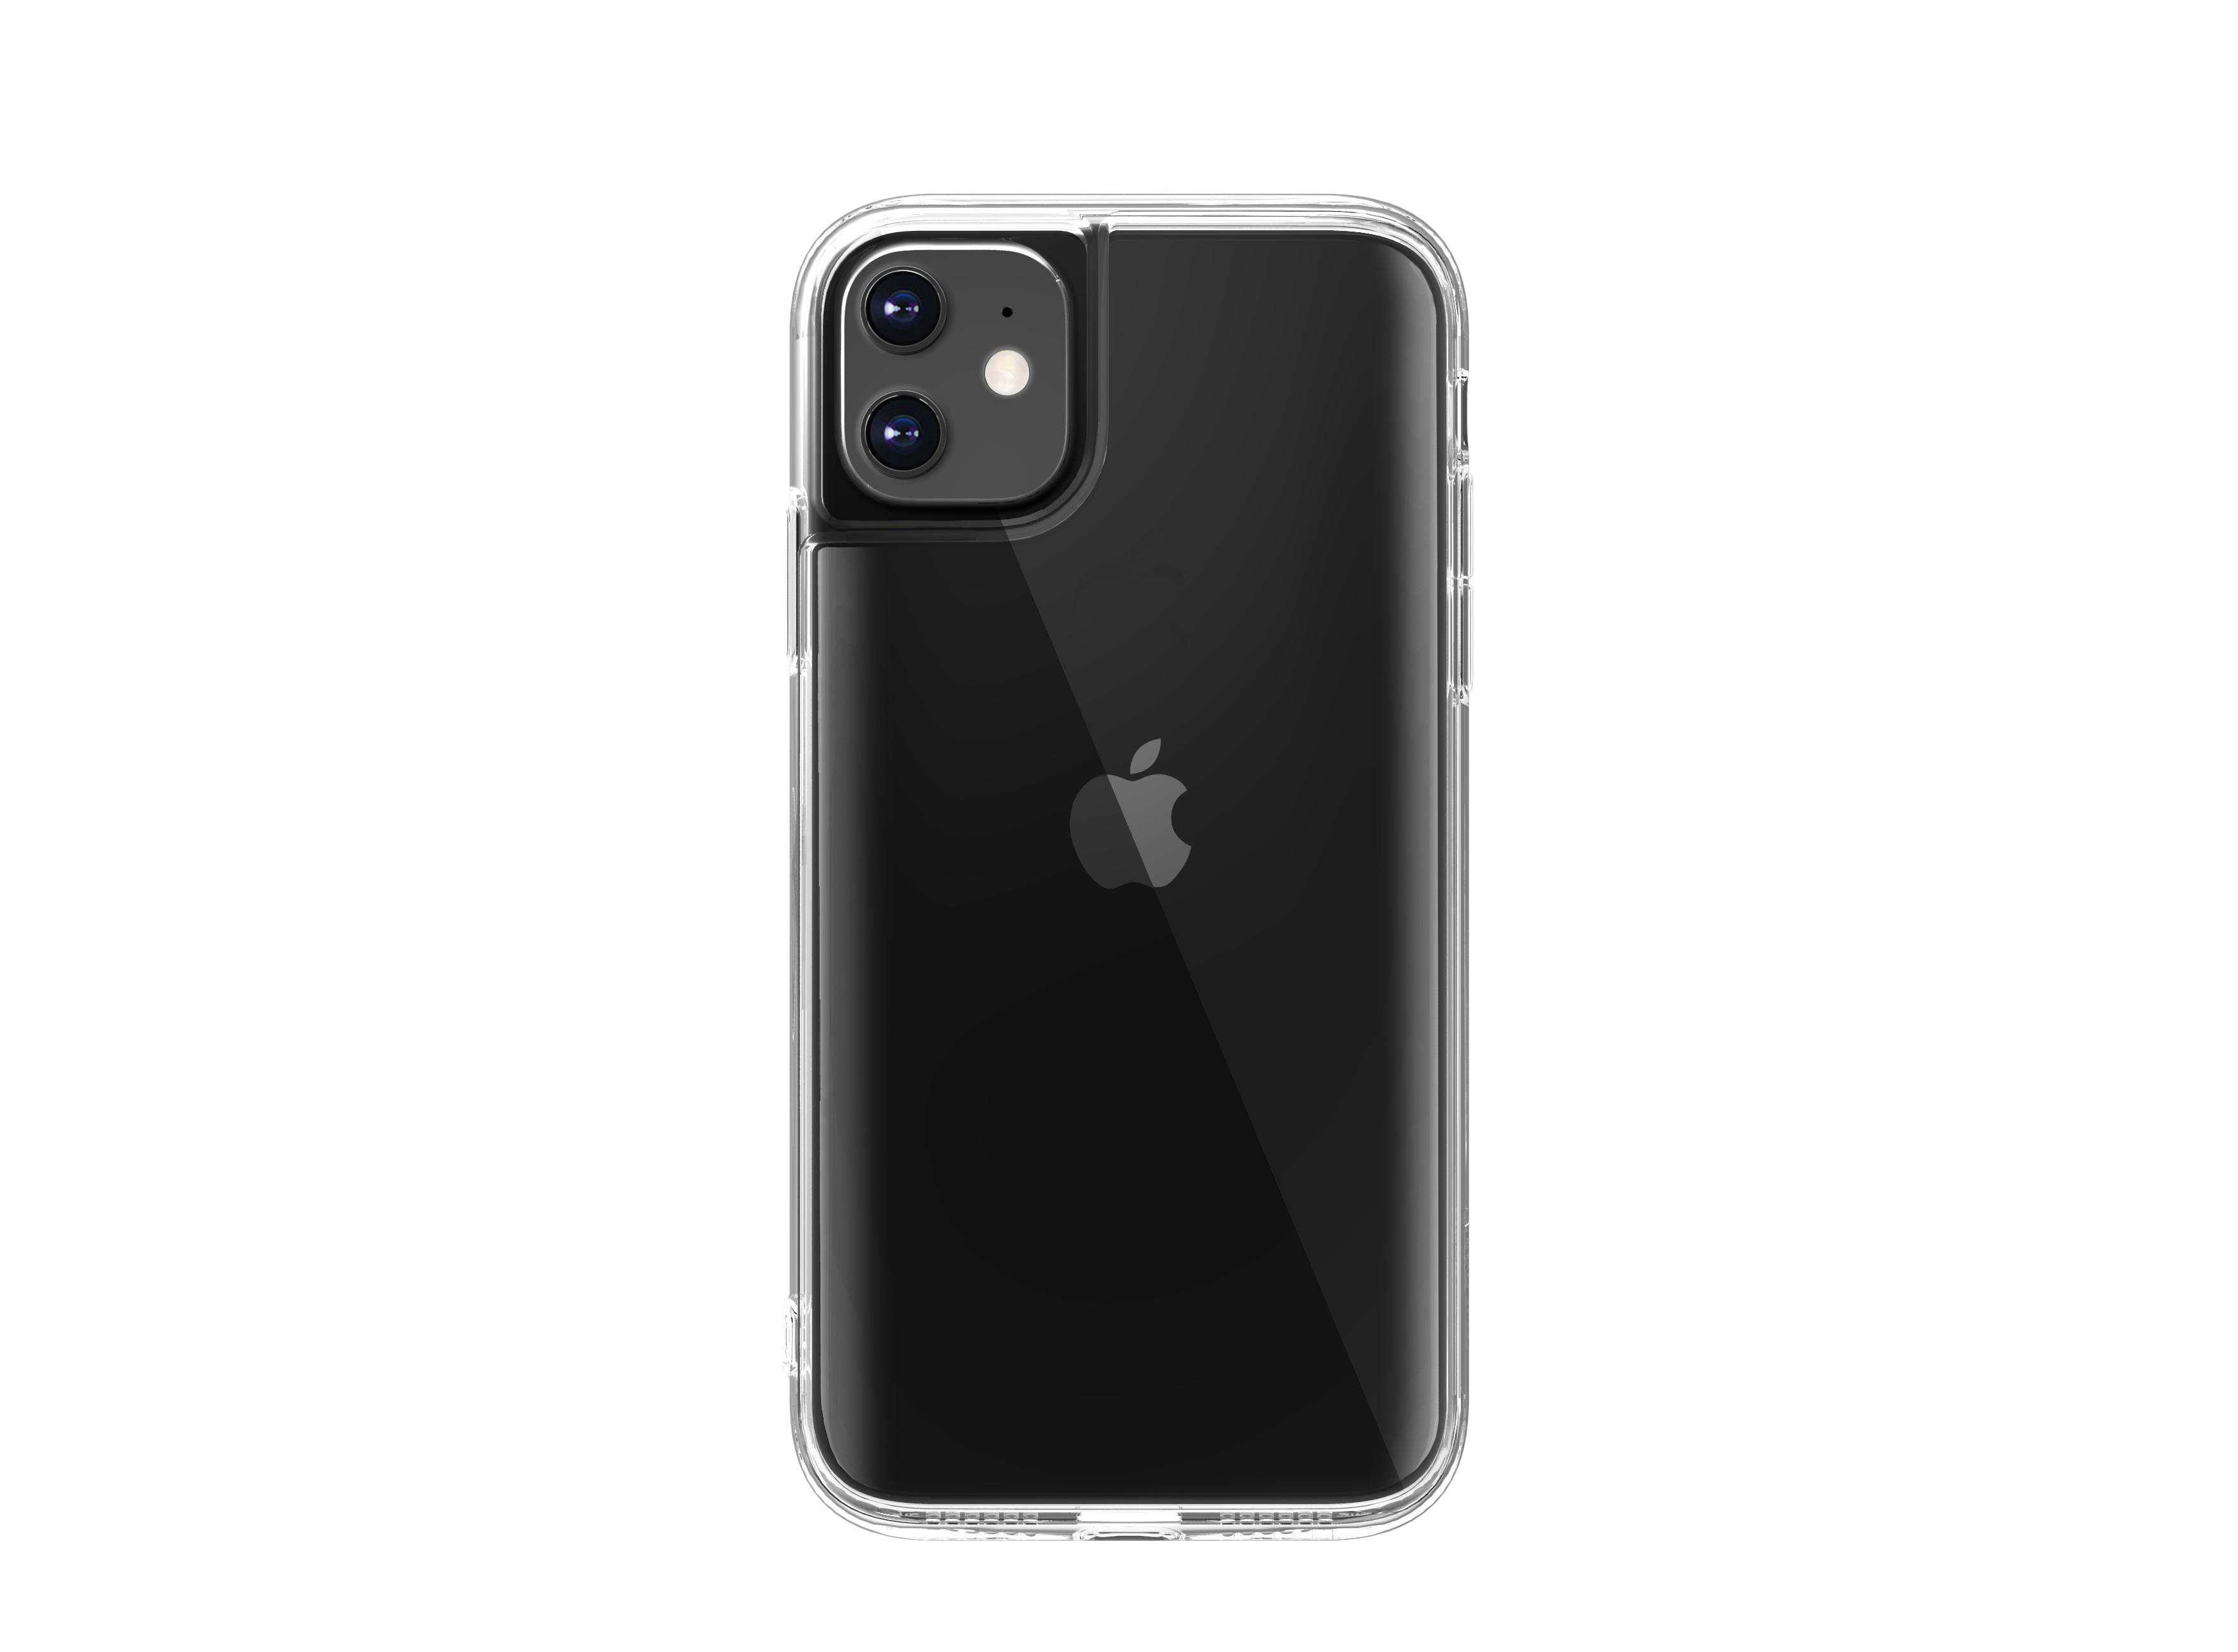 iPhone11-Black for linkase pro ADM